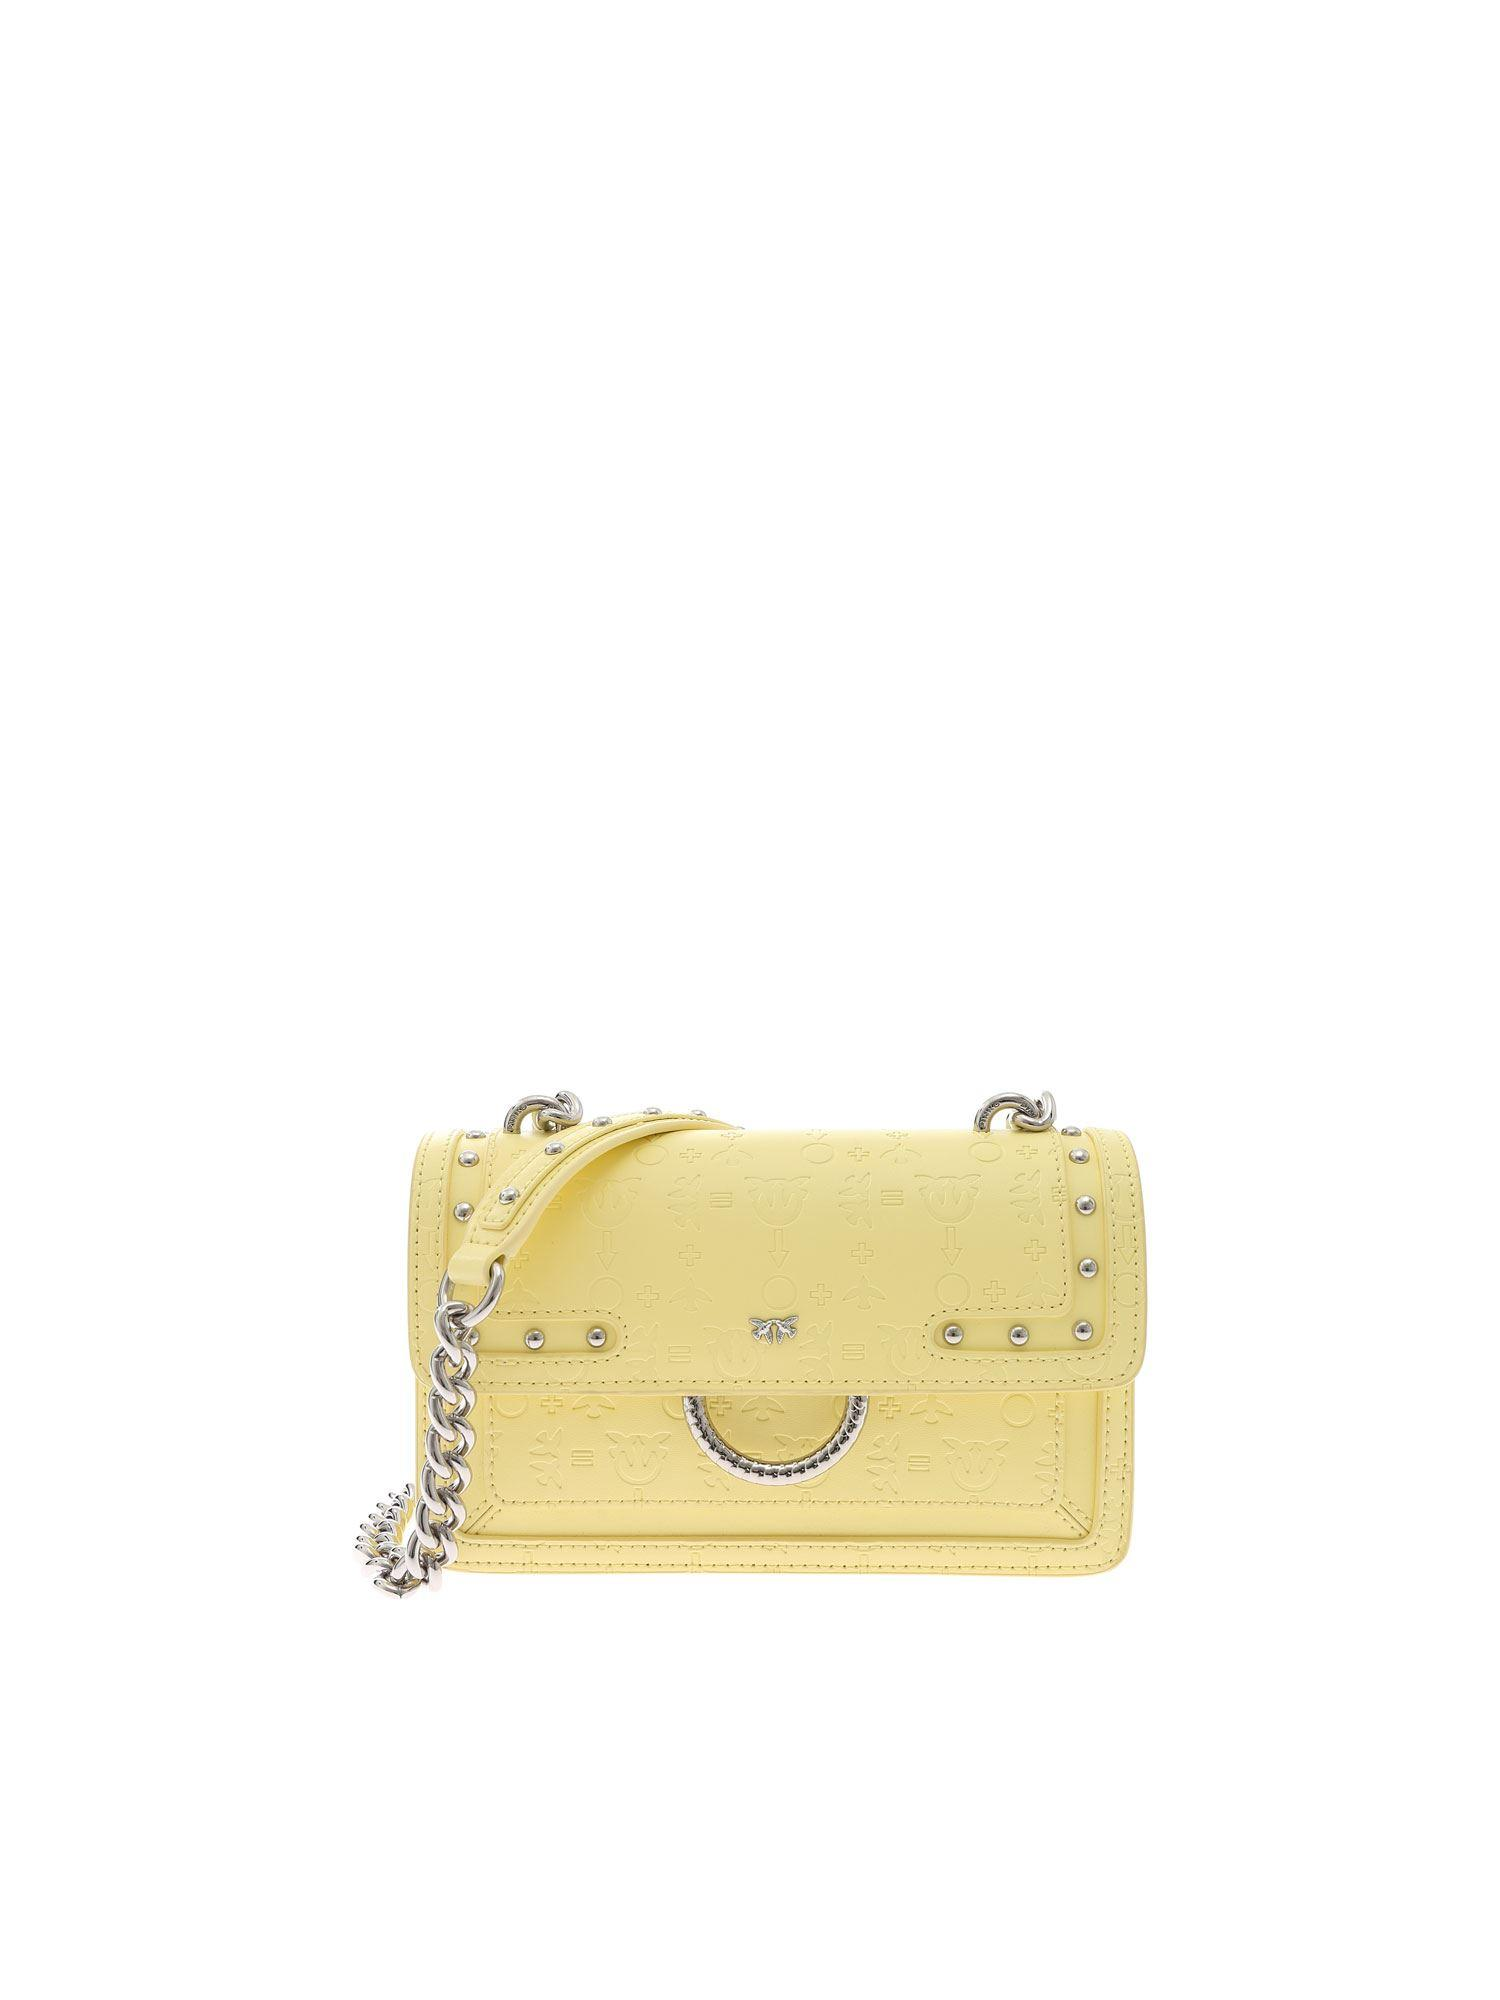 32139926bac Pinko - Mini Love Monogram Yellow Bag - Lyst. View fullscreen